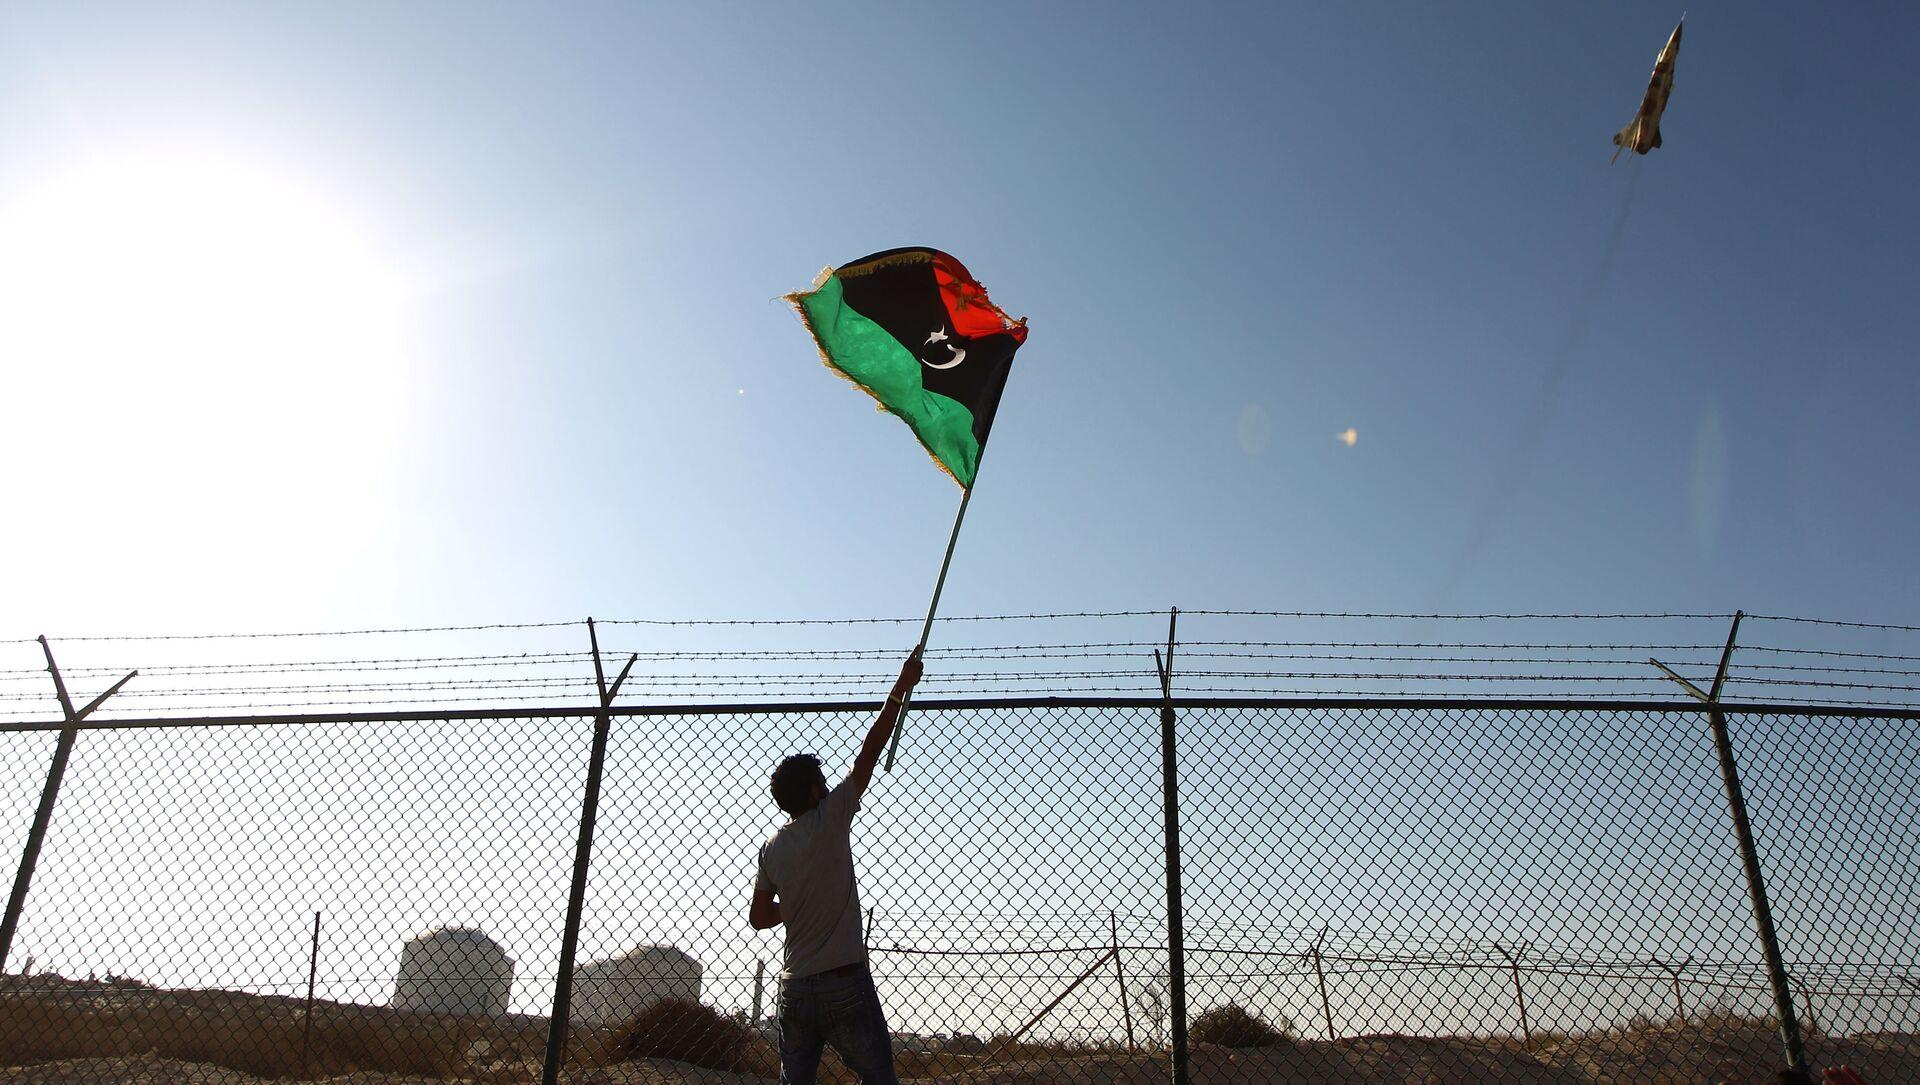 A man waves a Libyan flag - Sputnik International, 1920, 15.02.2021